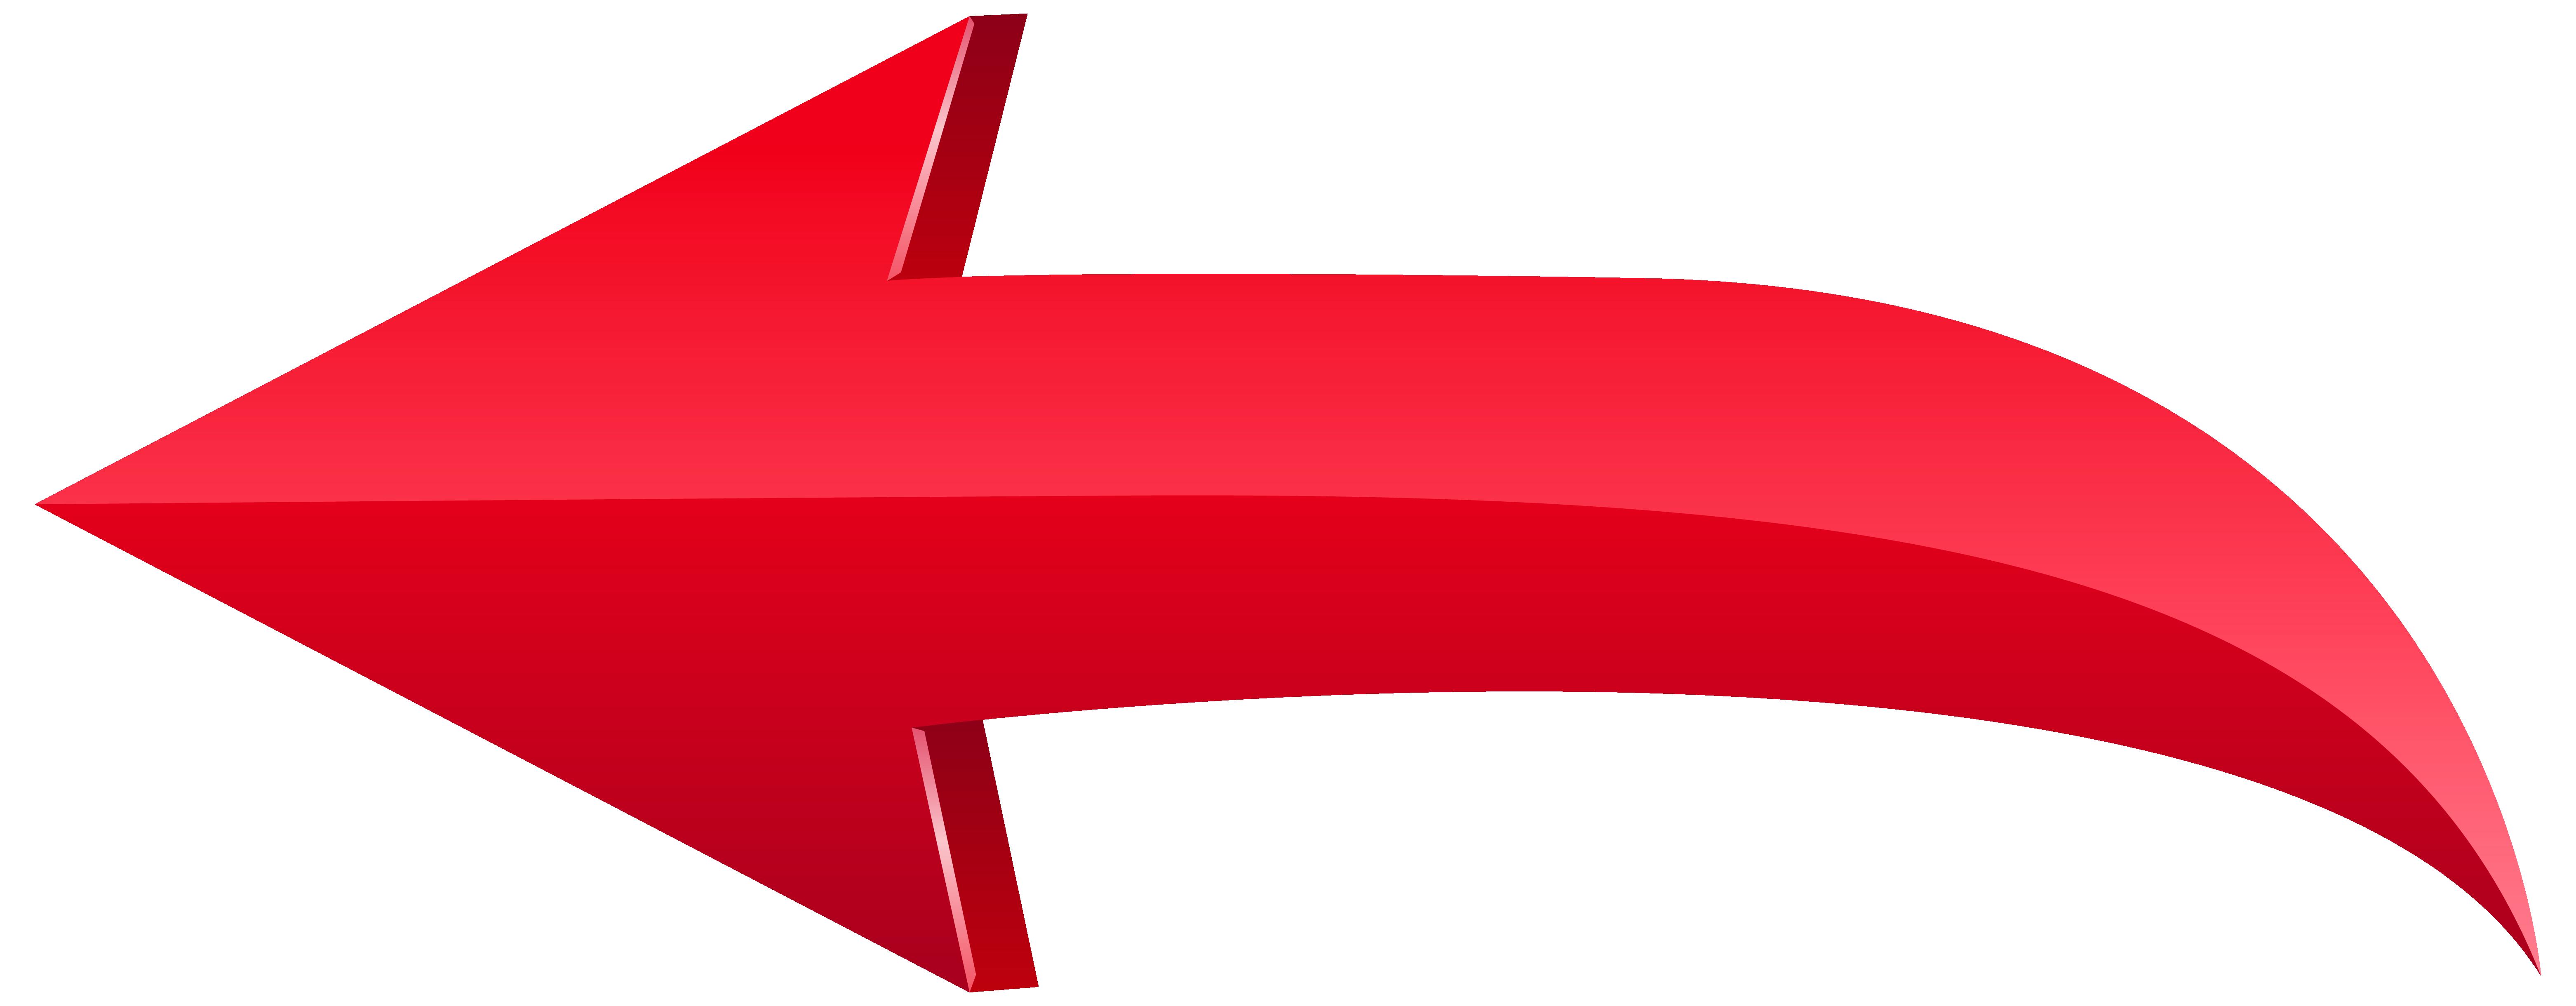 Christmas arrow clipart vector transparent stock Arrow Red Left PNG Transparent Clip Art Image | Images | Pinterest ... vector transparent stock